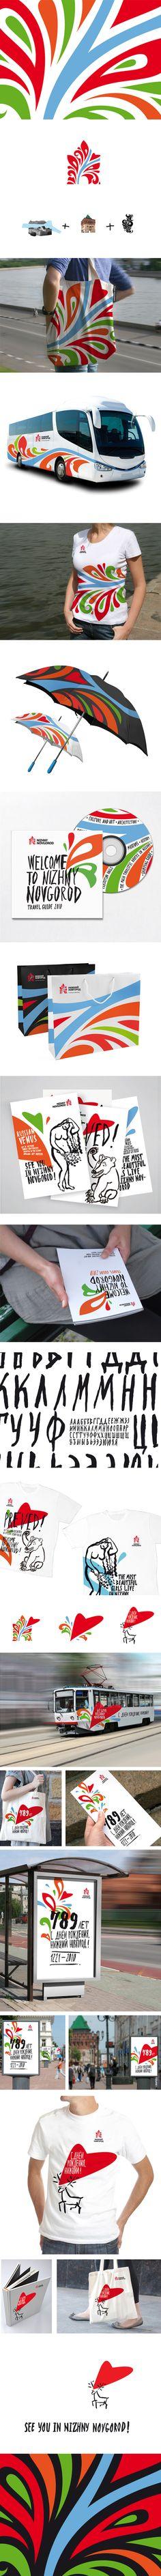 Identity for Nizhny Novgorod, Russia, developed at the British High School of Design by Masha Ponomareva #packaging #branding #marketing (sample)